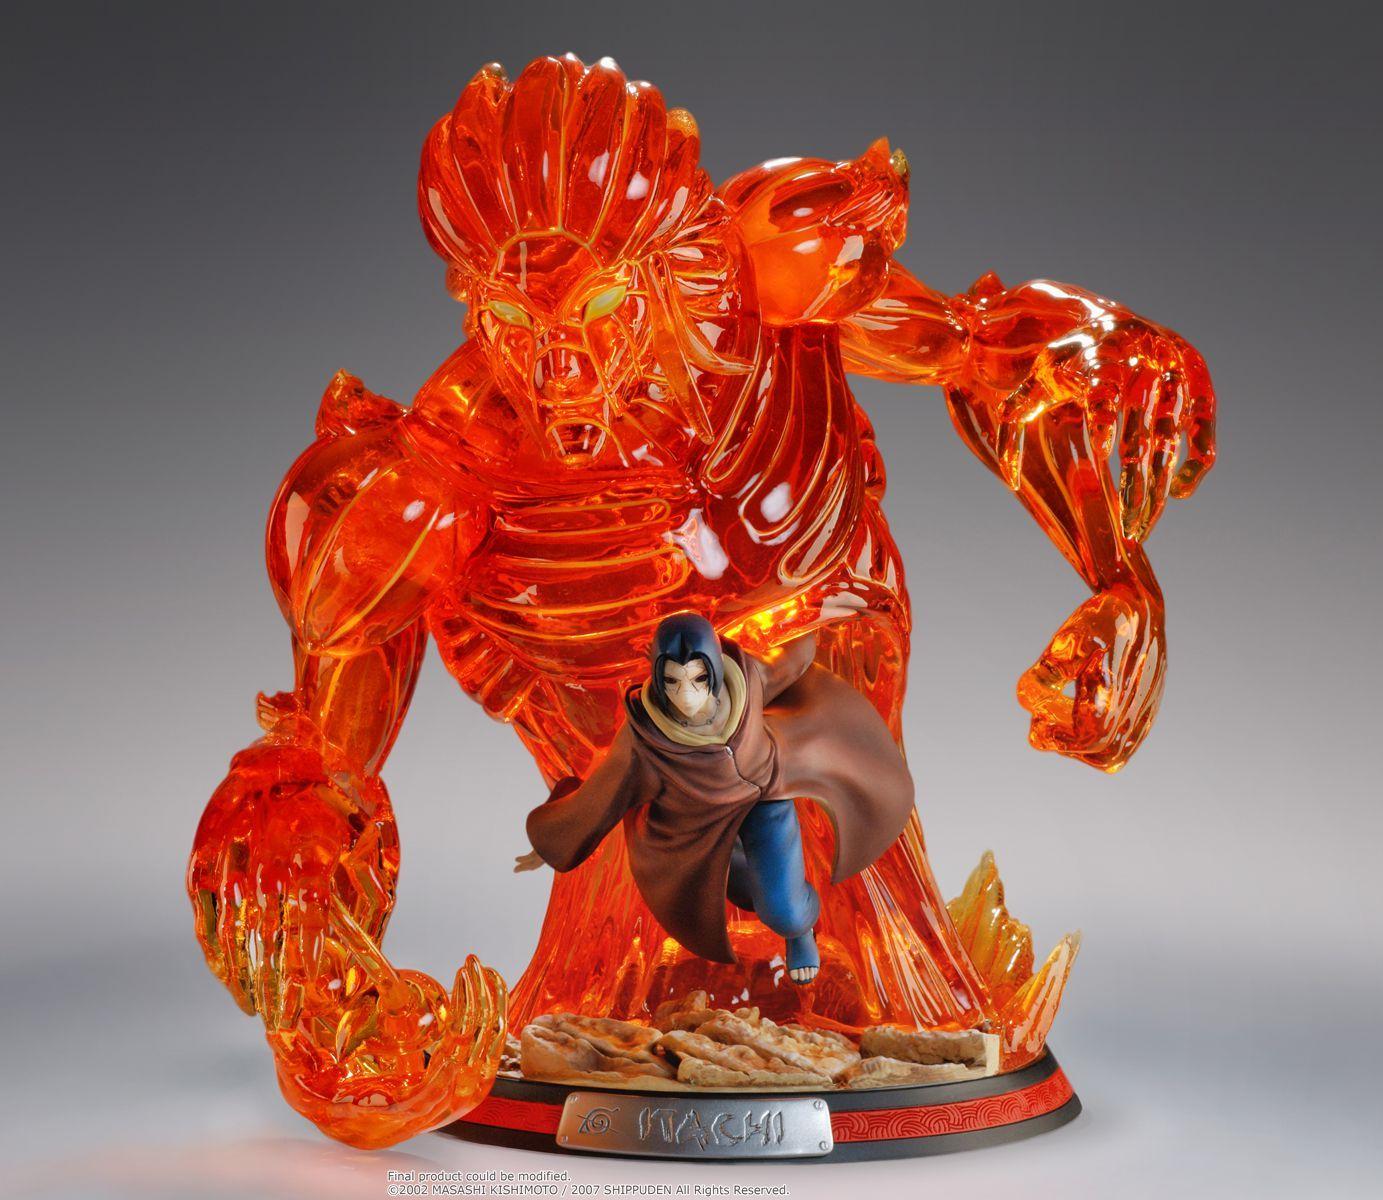 Itachi Uchiha High Quality Statue Hqs By Tsume Anime Manga Art Chunli Naruto